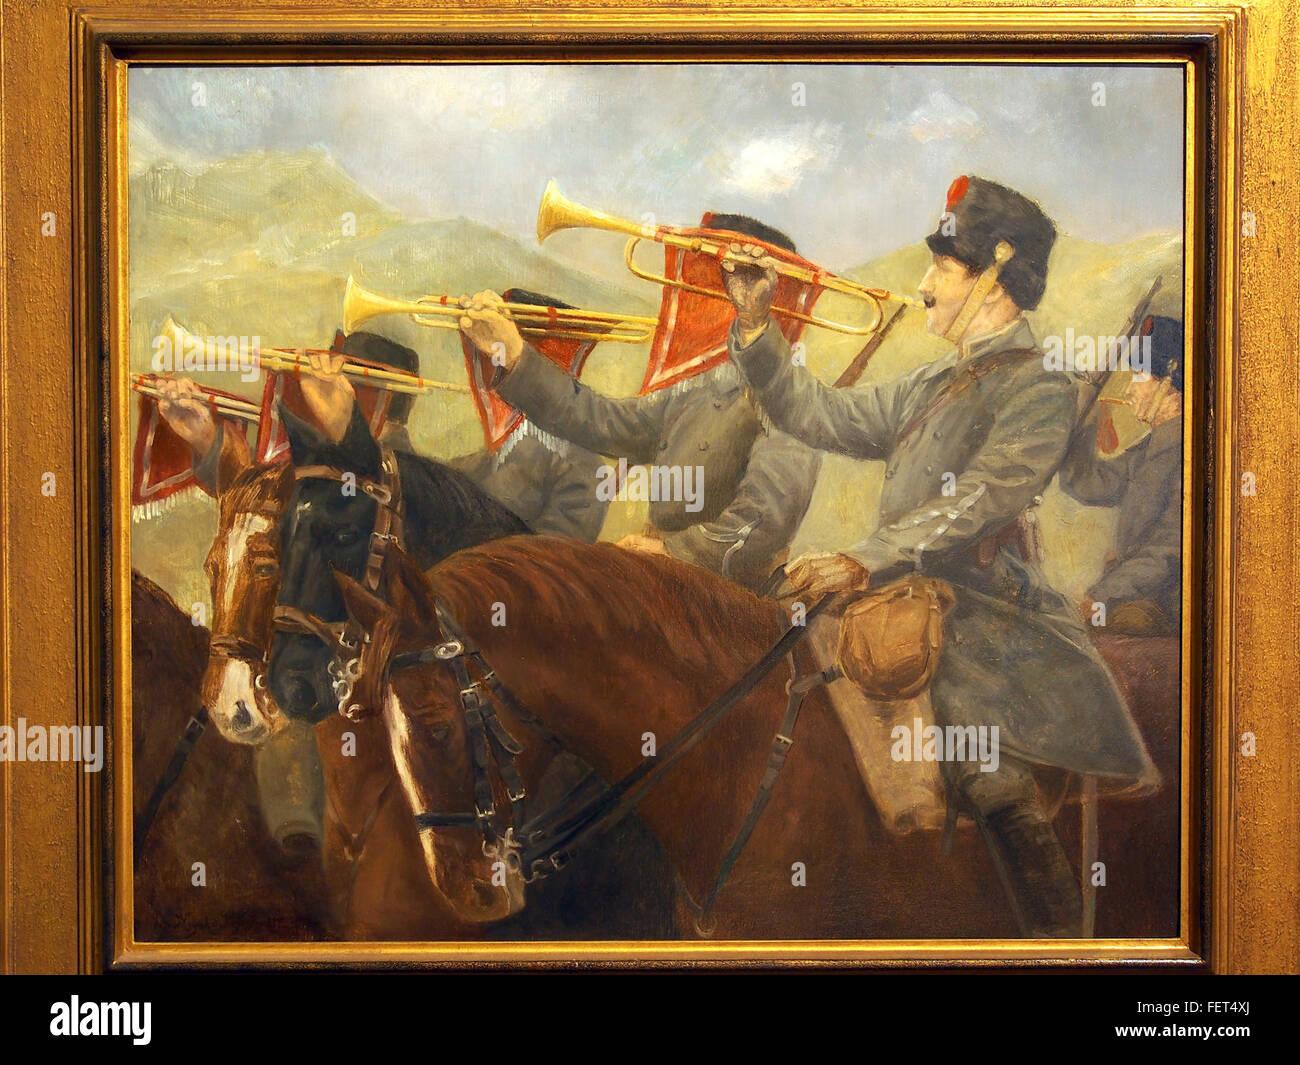 Dutch Cavalry Museum, Bernhardkazerne pic12 - Stock Image